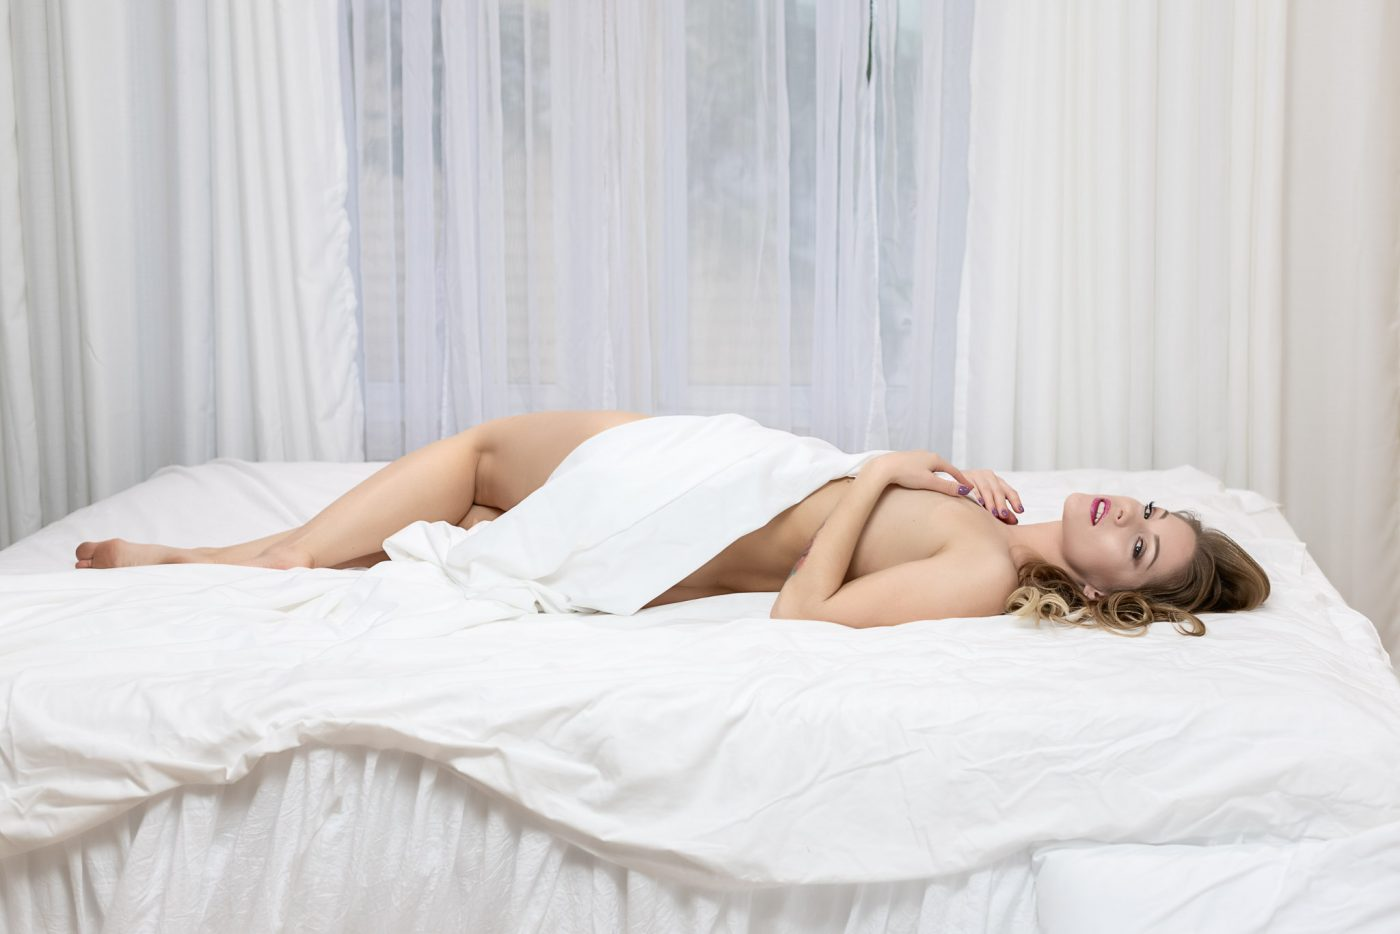 Implied Nudity at Houston boudoir studio Heights Boudoir